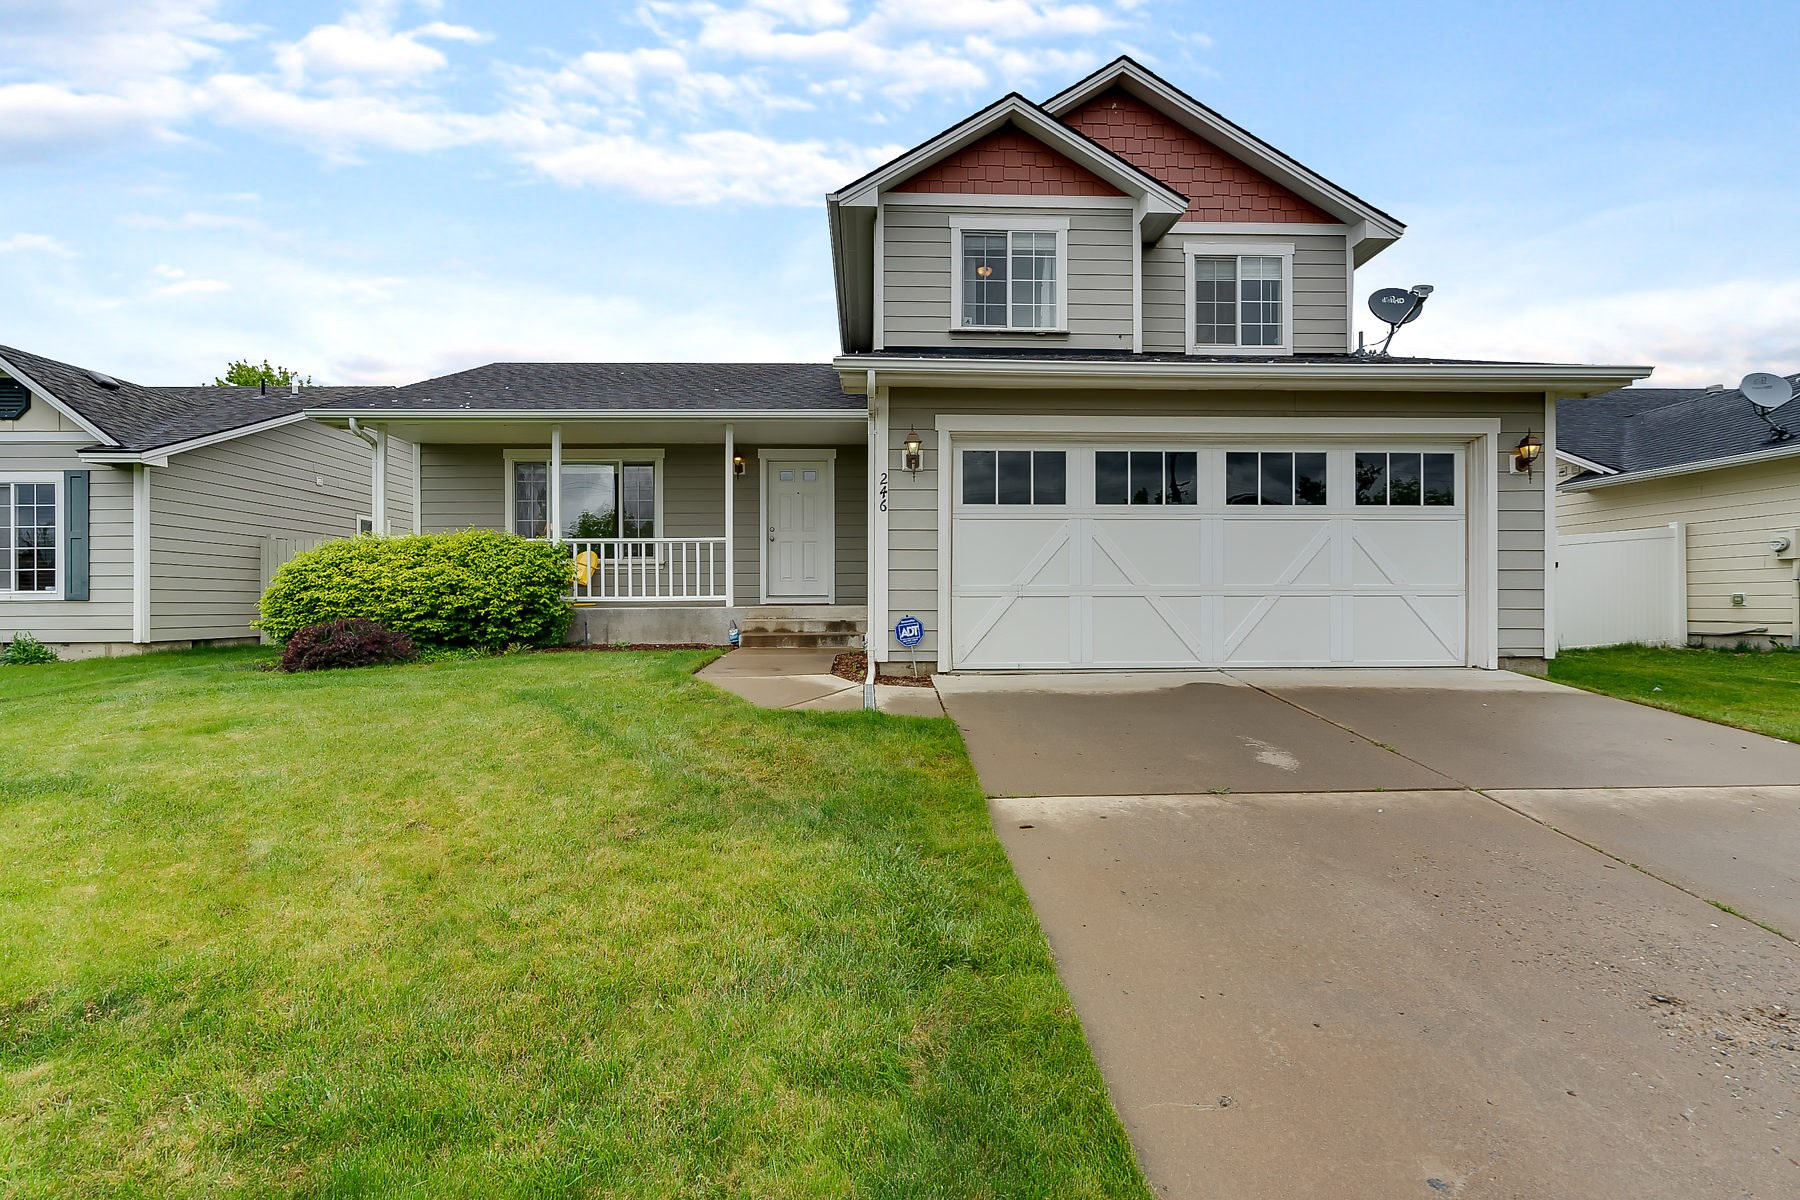 Post Falls, ID Home For Sale Near Coeur d'Alene & Spokane WA